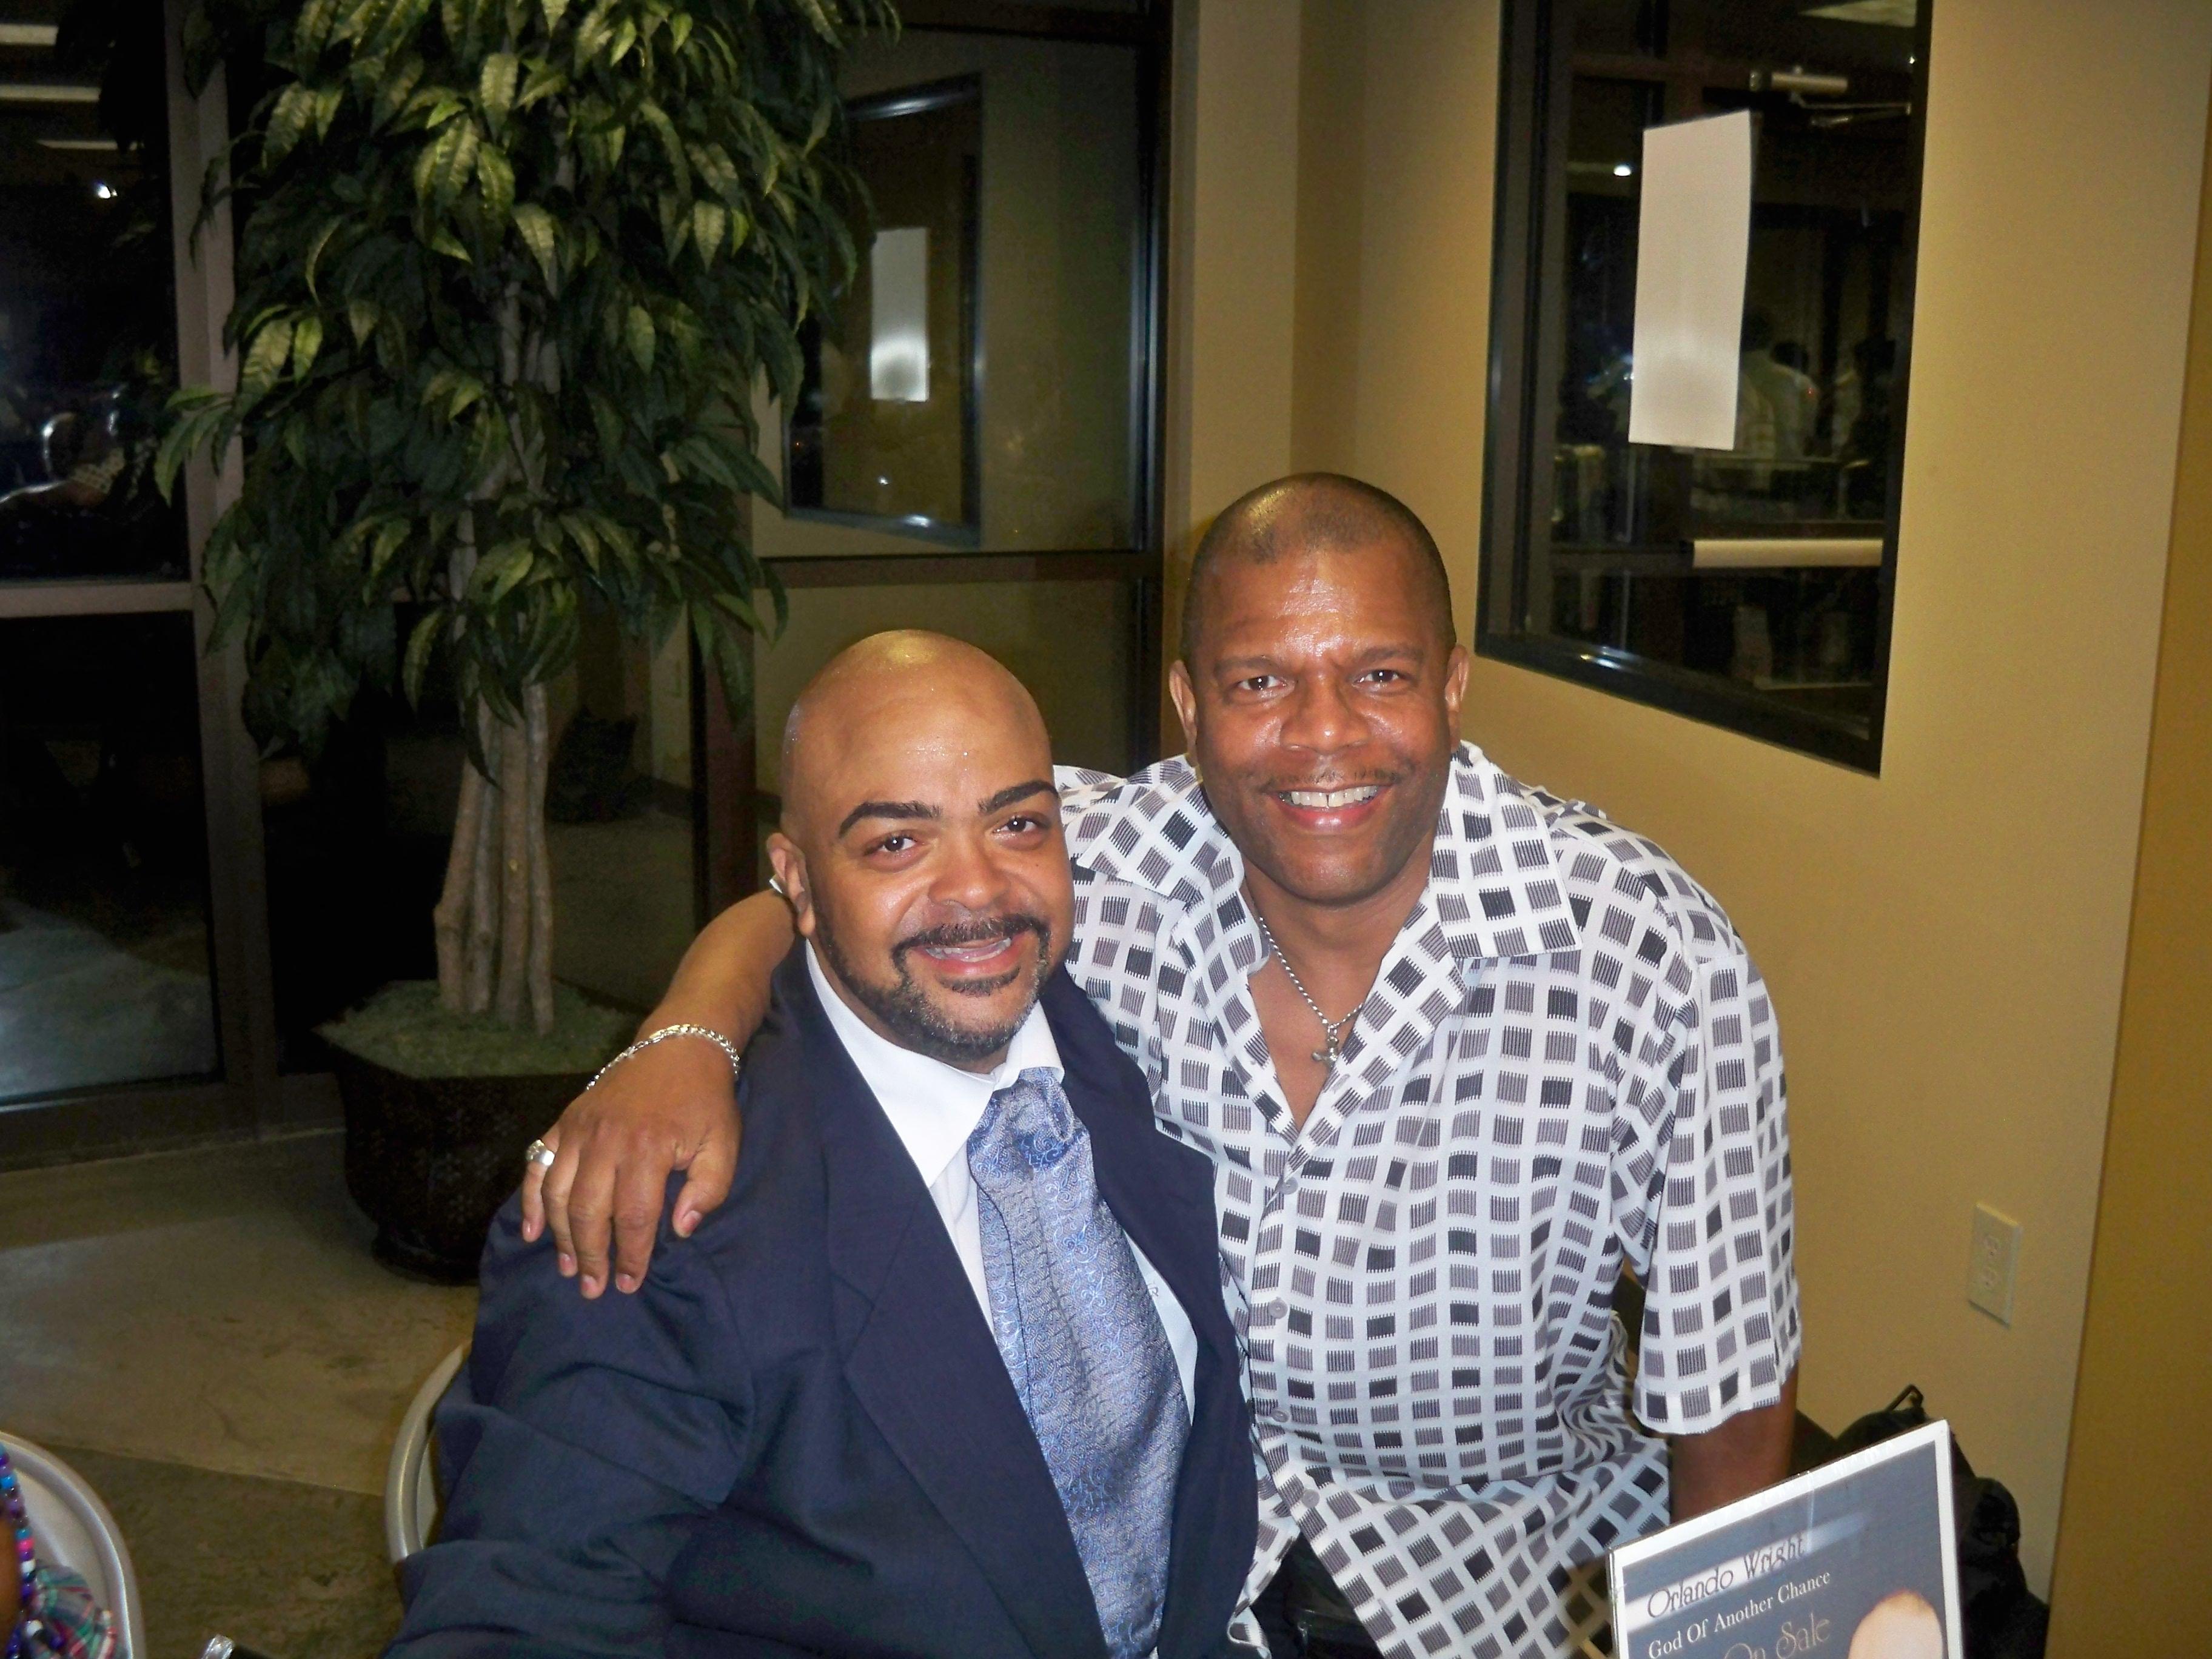 Bruce and Orlando Wright